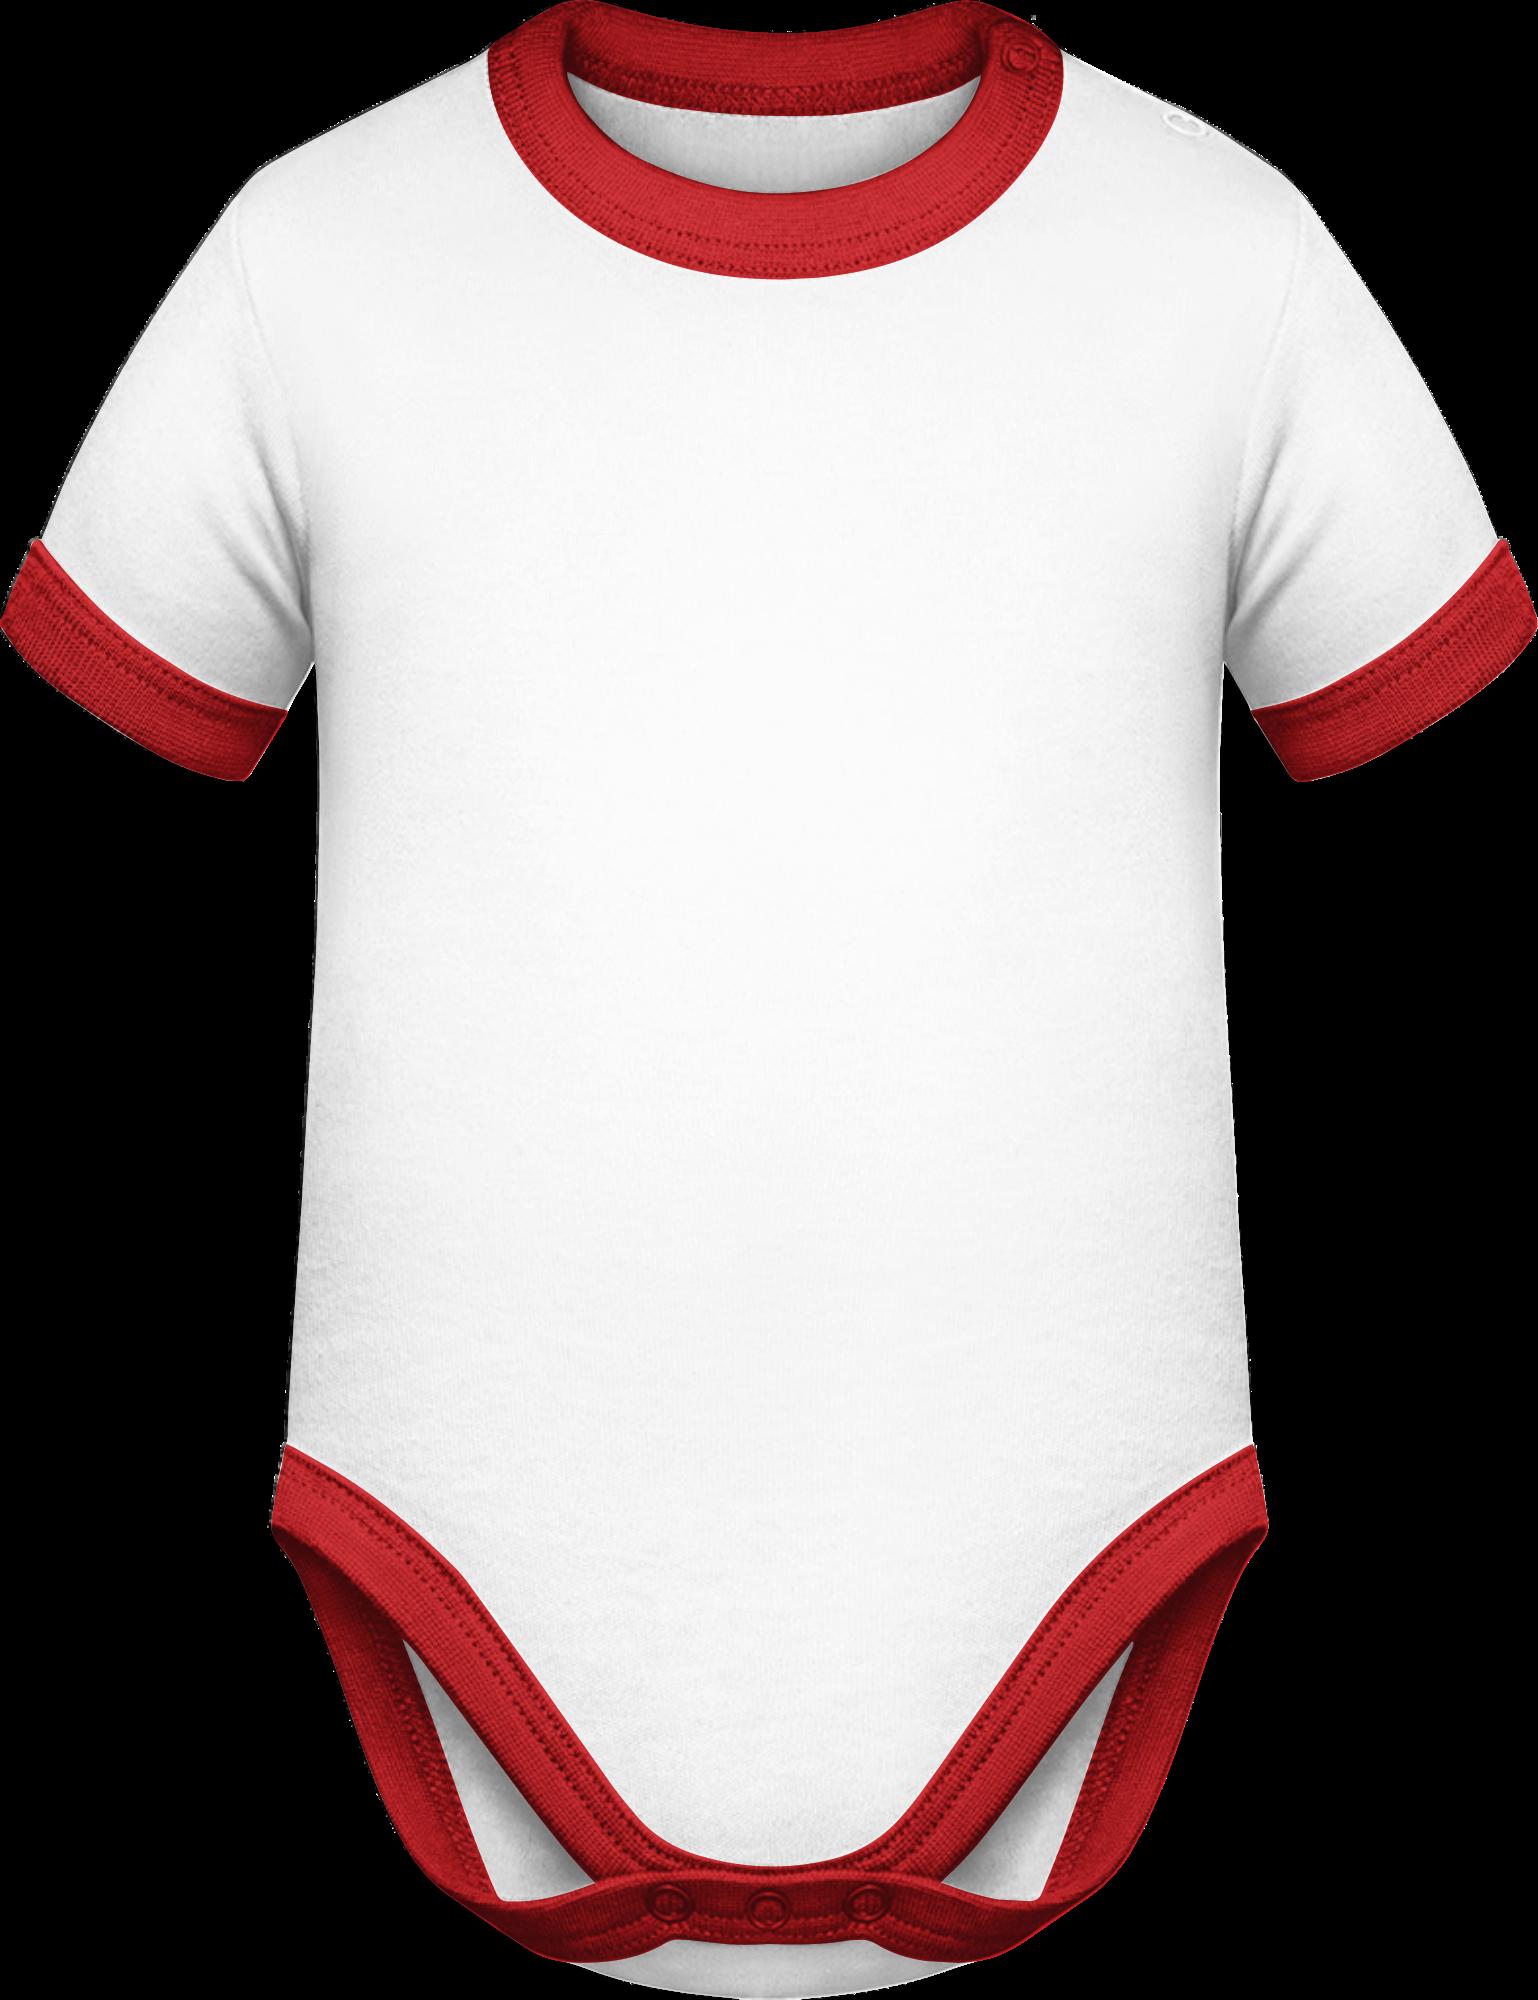 BabyBugz Ringer Bodysuit